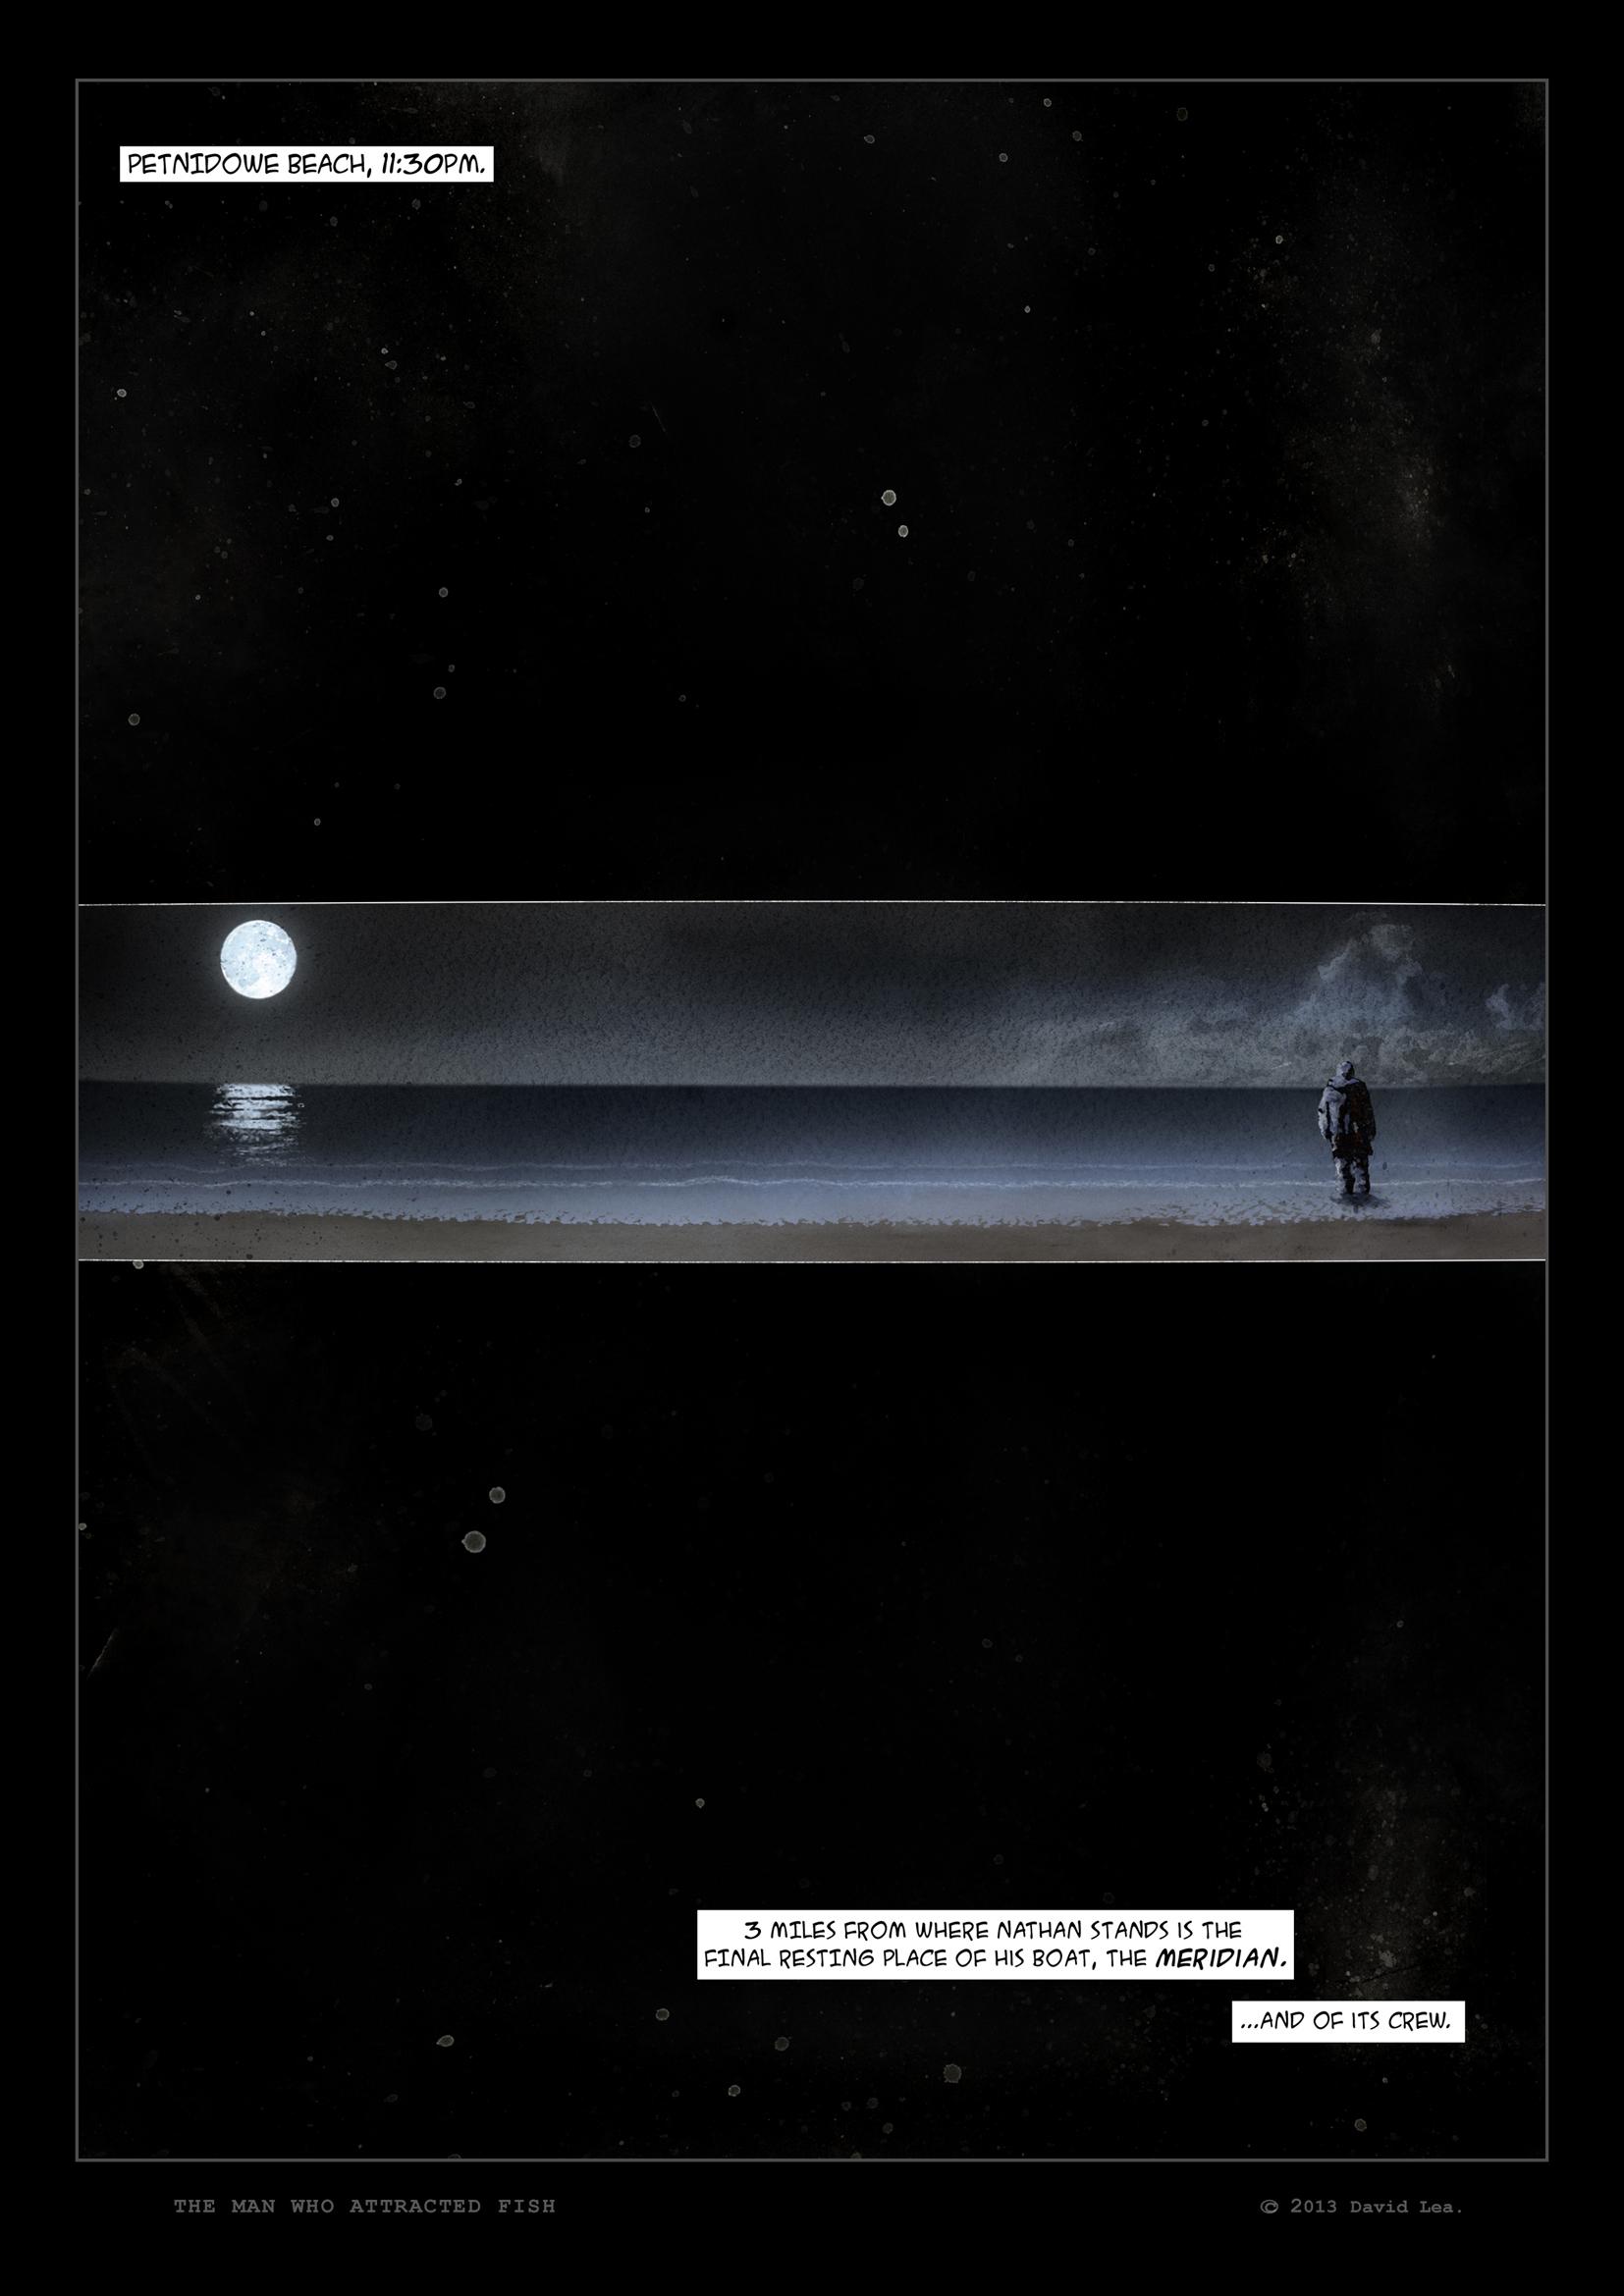 TMWAF_Graphic novel scene - page 1